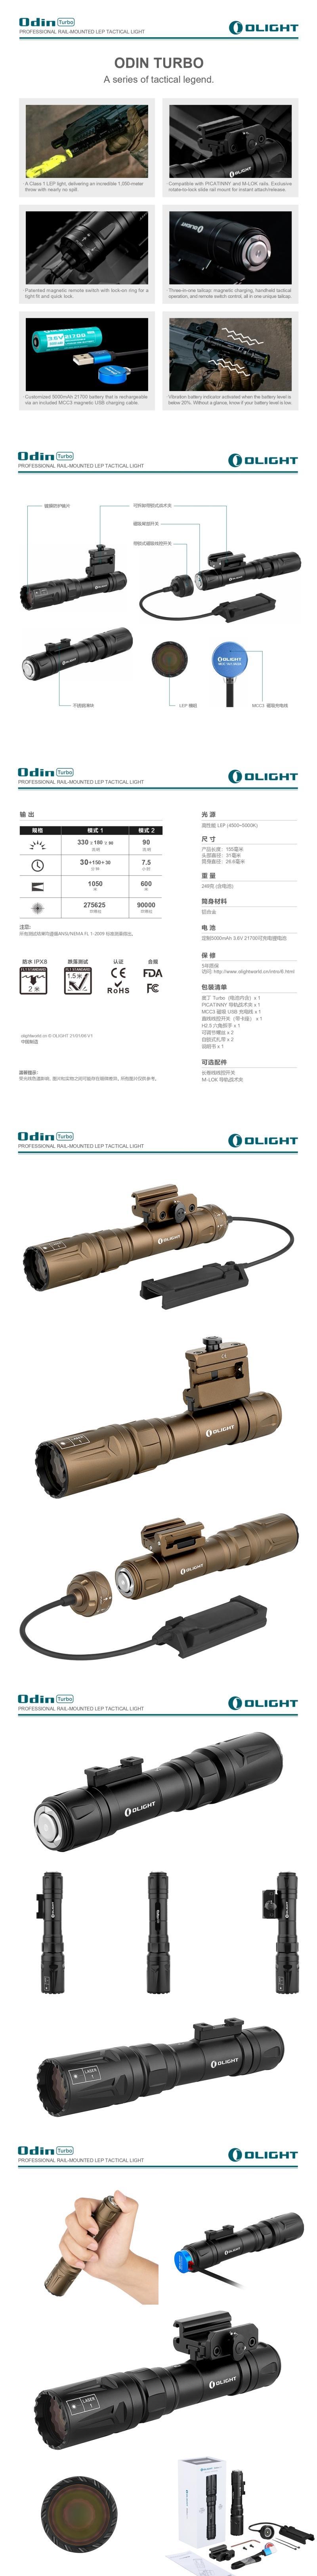 【錸特光電】OLIGHT ODIN TURBO LEP 奧丁 1050米 超遠射程  戰術槍燈 White laser PICATINNY tactical flashlight (2)